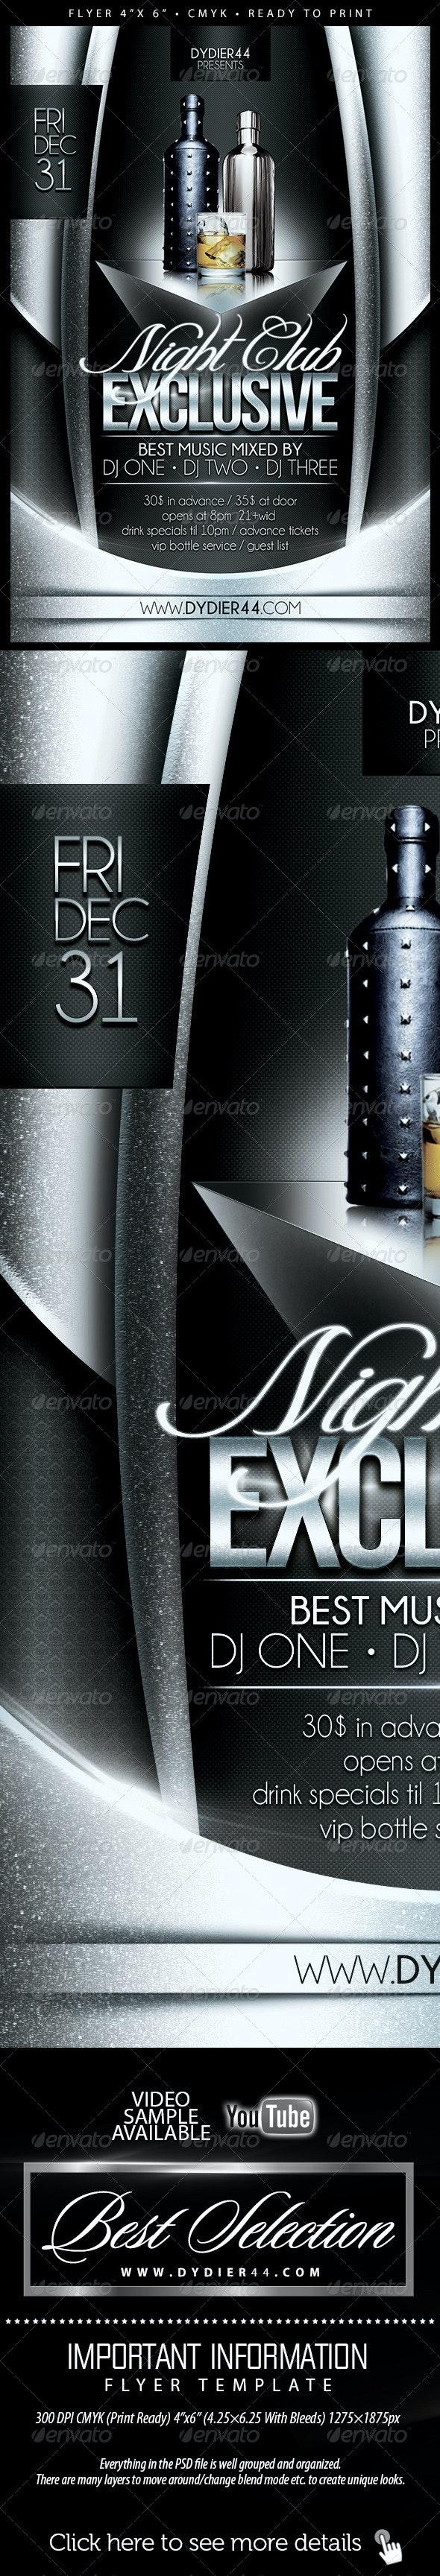 Nightclub Exclusive (Flyer Template 4x6) - Flyers Print Templates